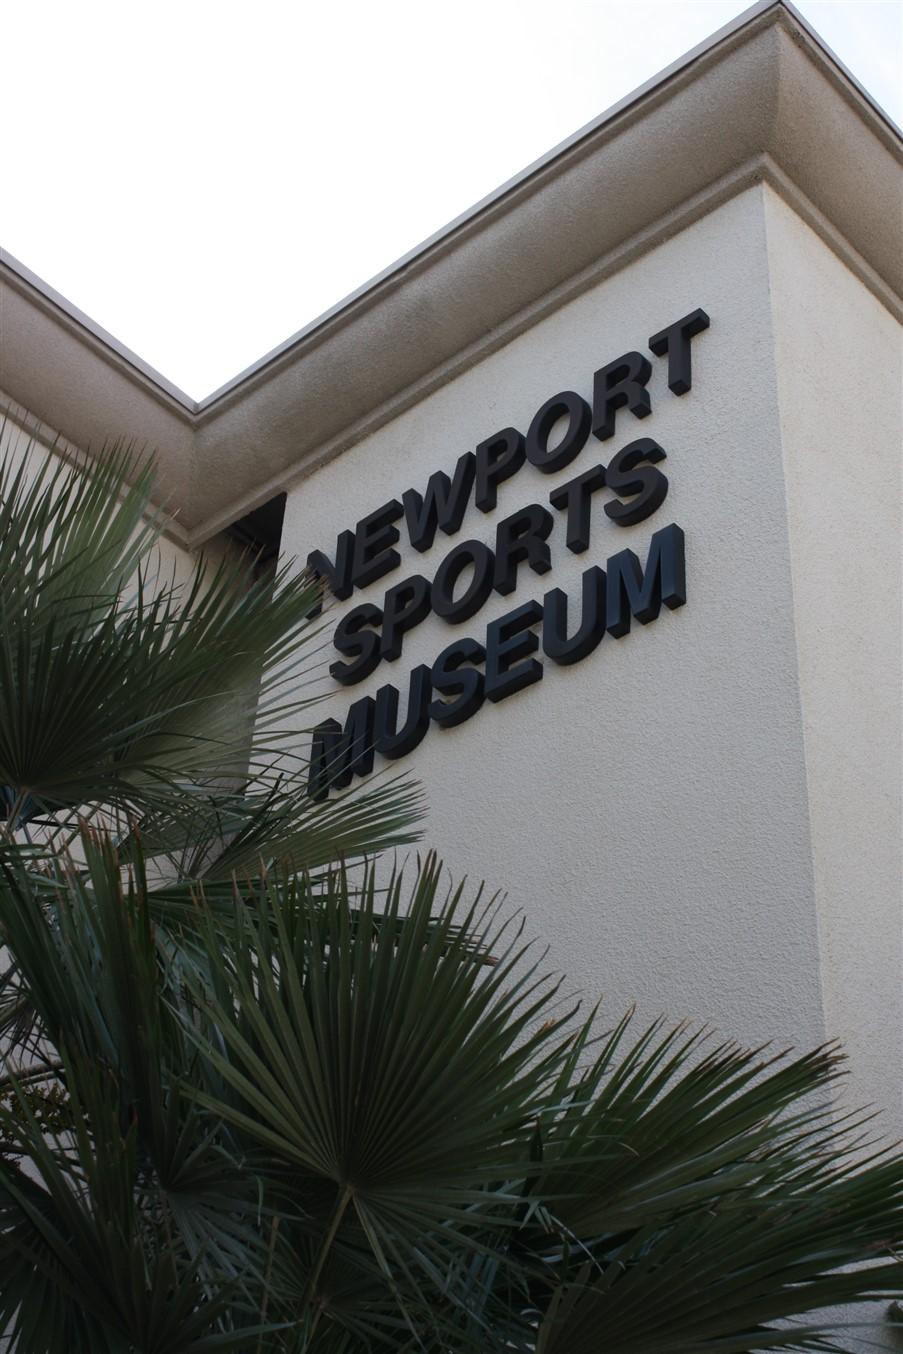 2012 03 12 14 Newport Sports Museum.jpg